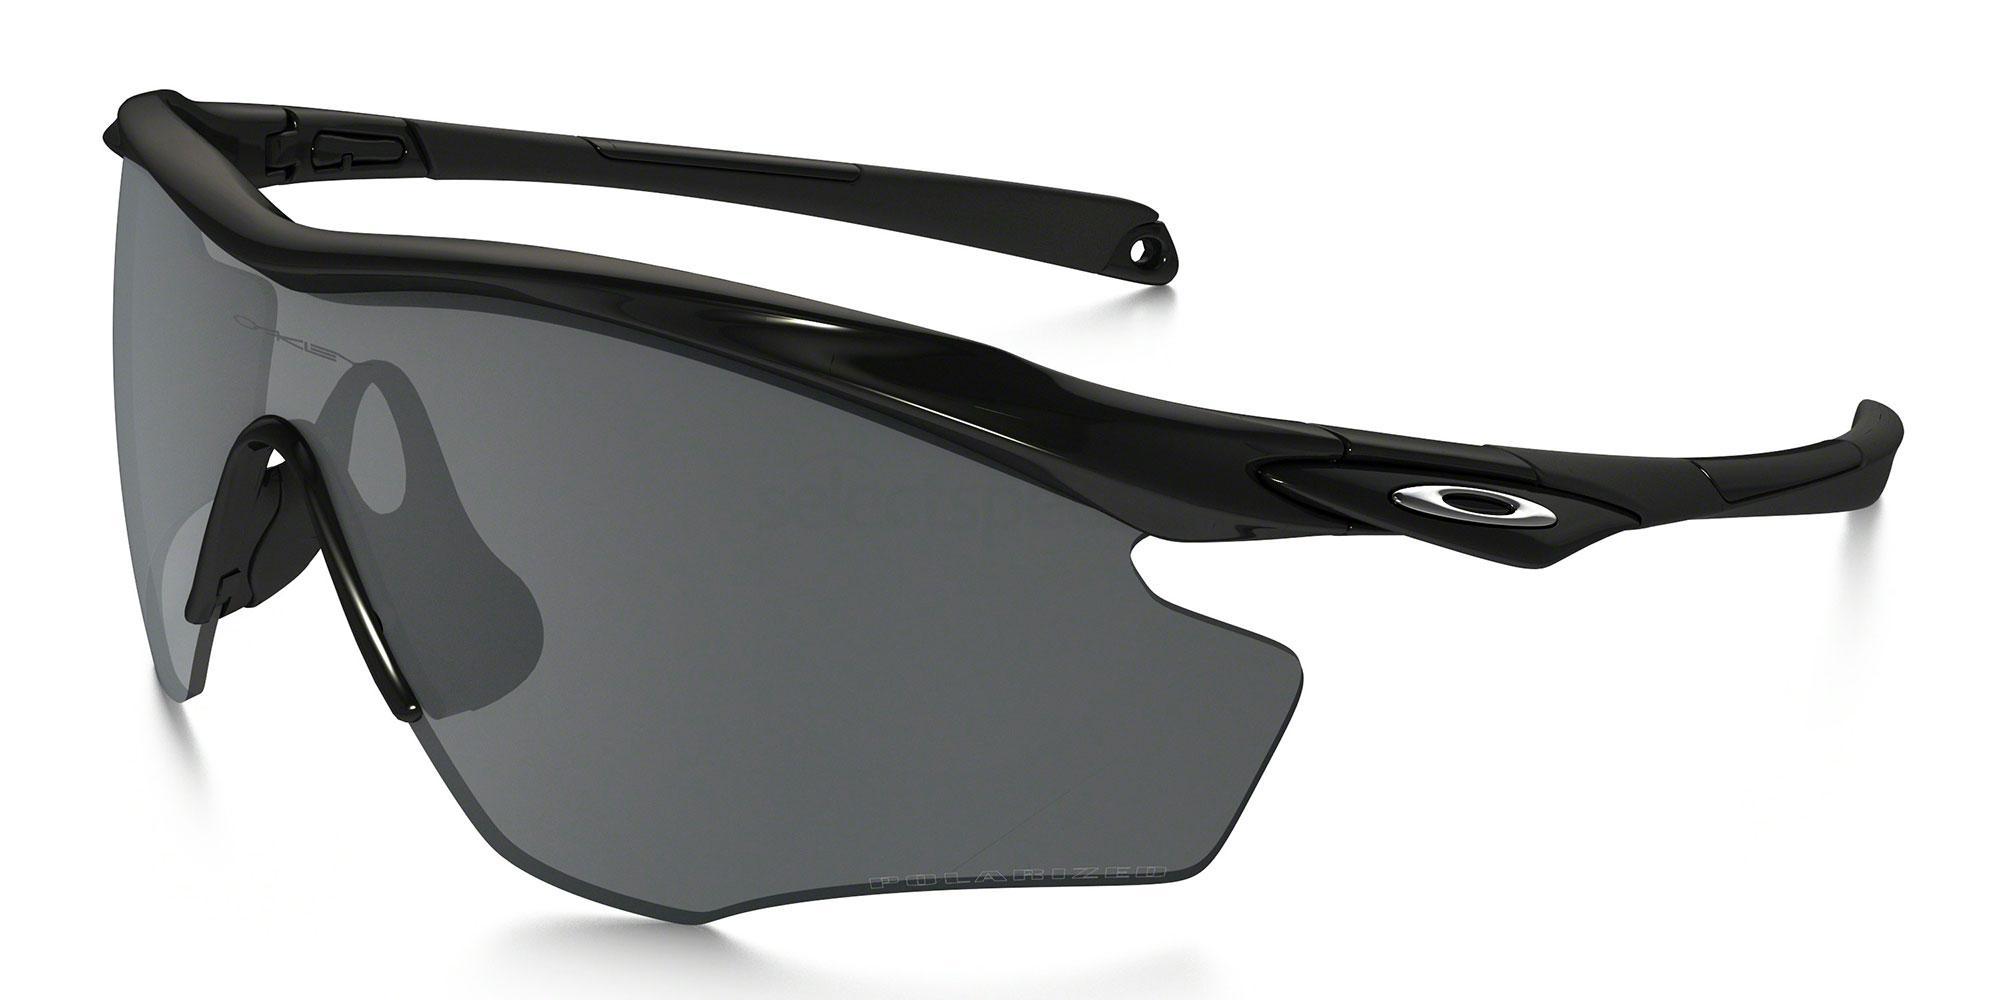 c9092b56a OO9343M2 934309 934301 934304 934305 934308. oakley oo9343 m2 frame xl  sunglasses